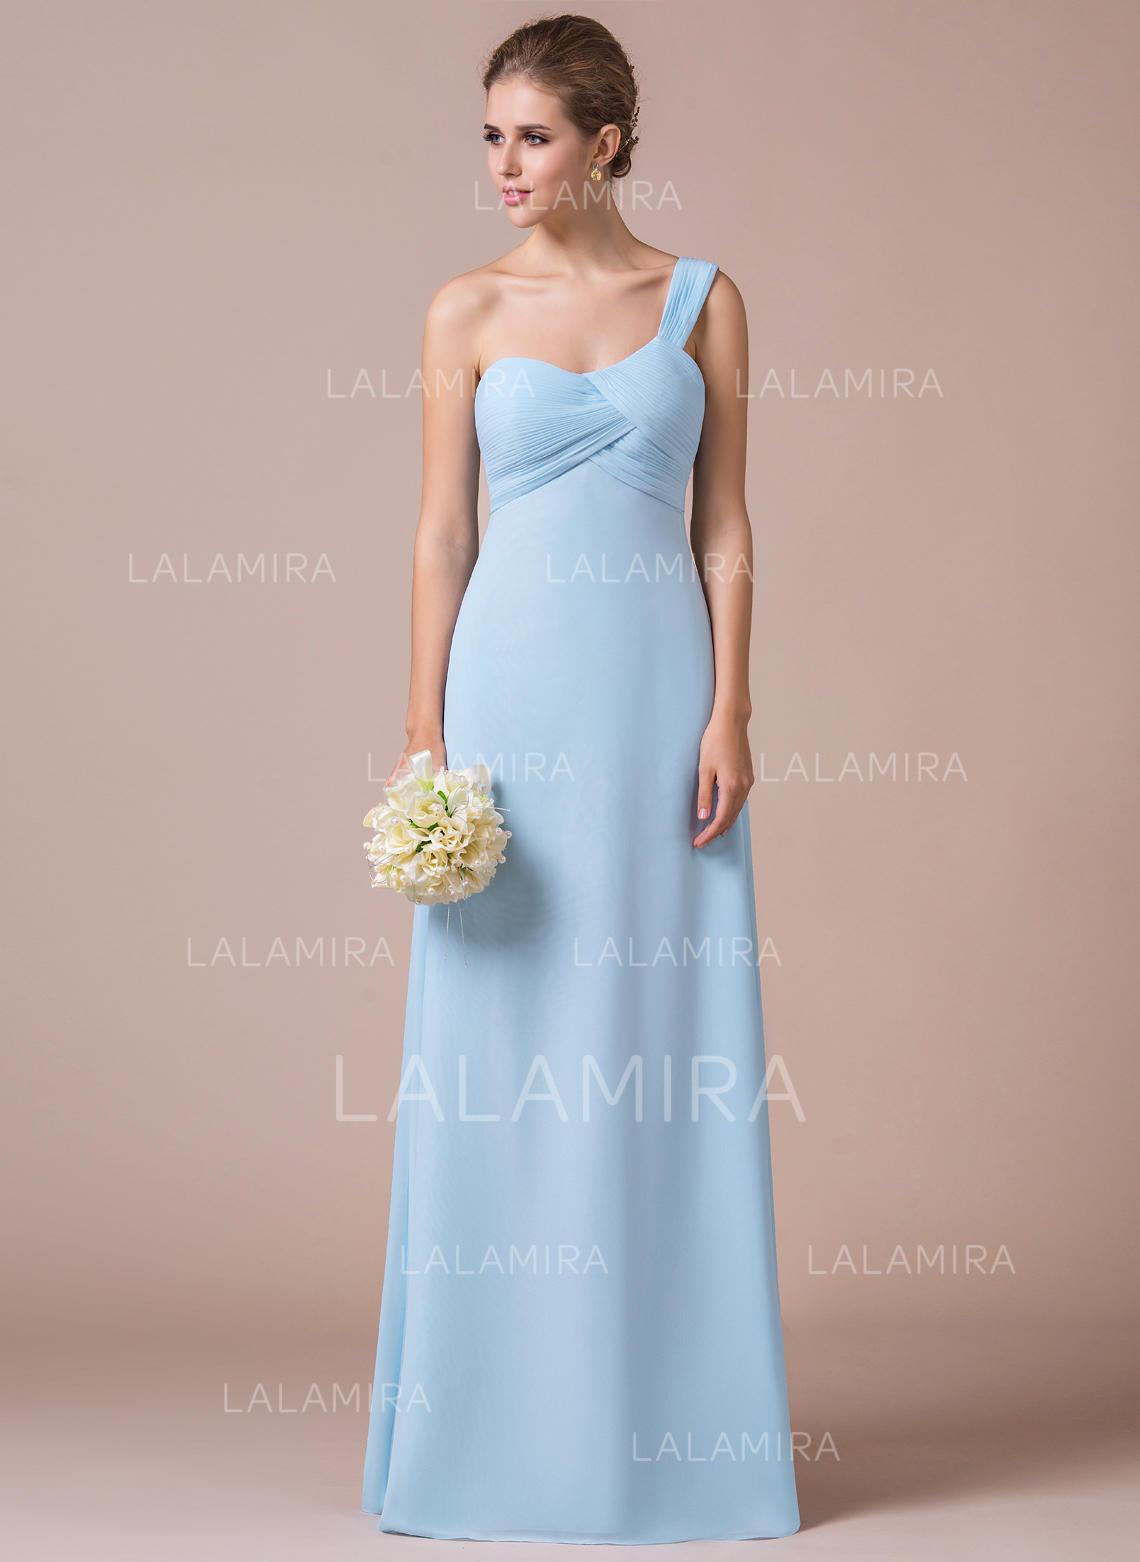 02fc1de68e Empire Chiffon Bridesmaid Dresses Ruffle One-Shoulder Sleeveless Floor- Length (007057411). Loading zoom